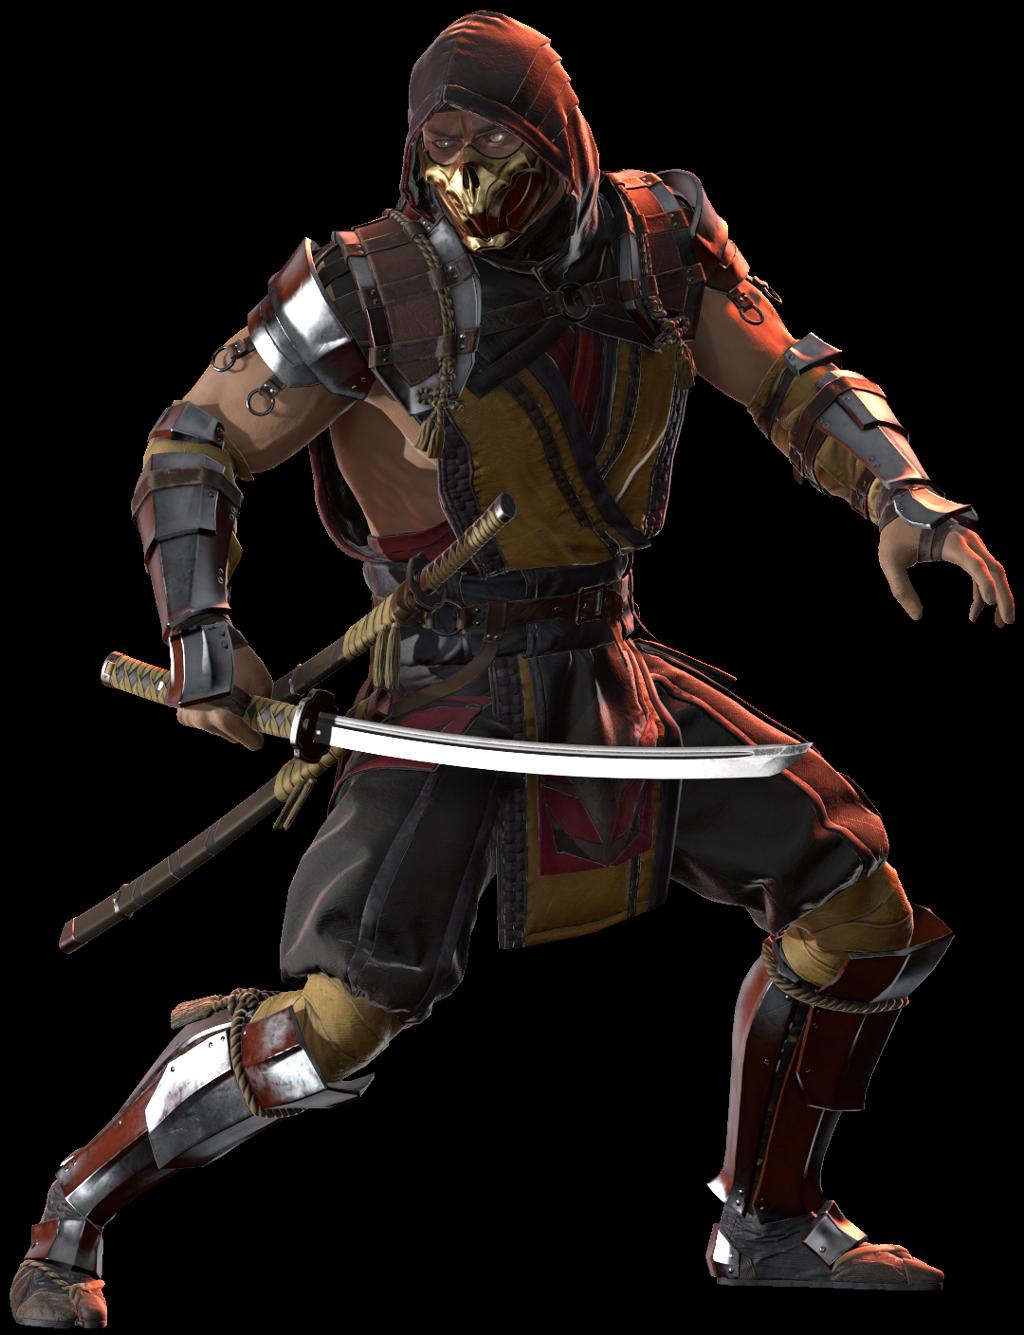 Scorpion Mortal Kombat Villains Wiki Fandom